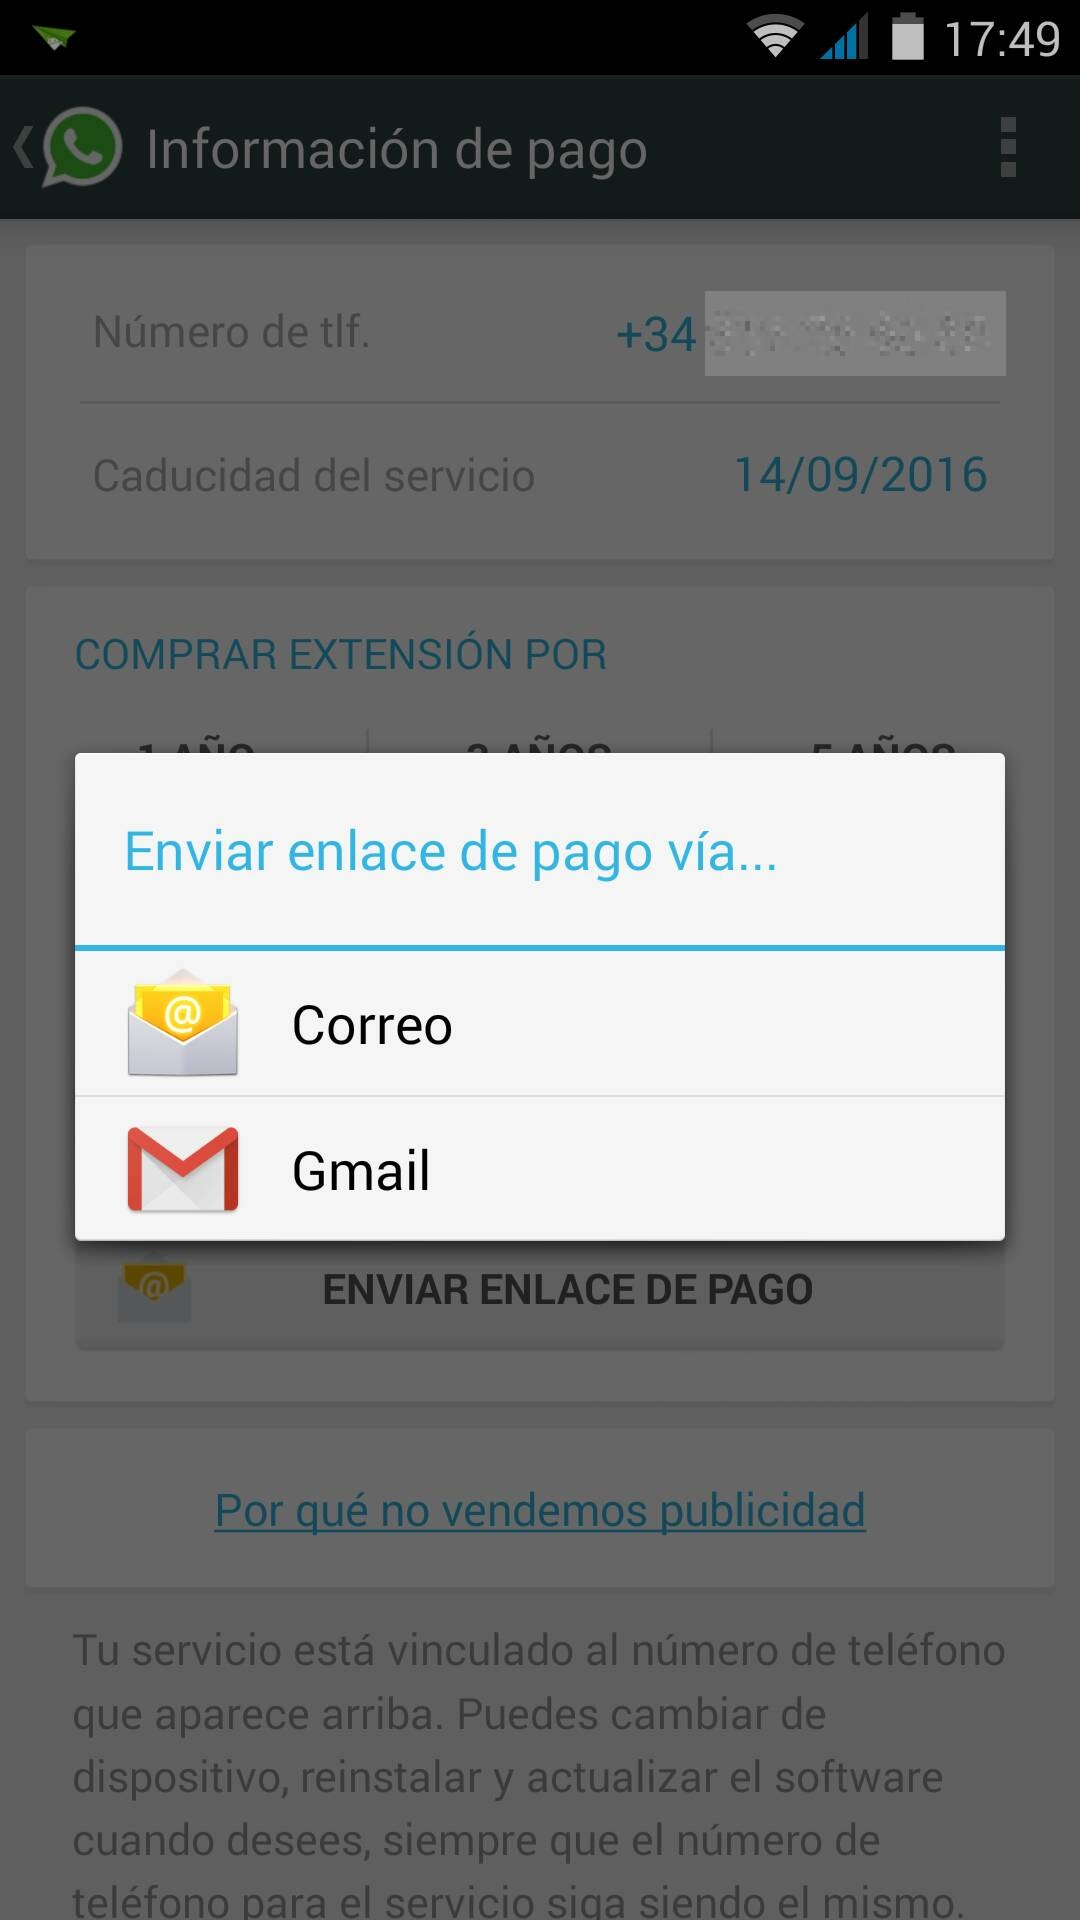 http://img110.xooimage.com/files/7/e/5/whatsapp-gmail-4afacb7.jpg